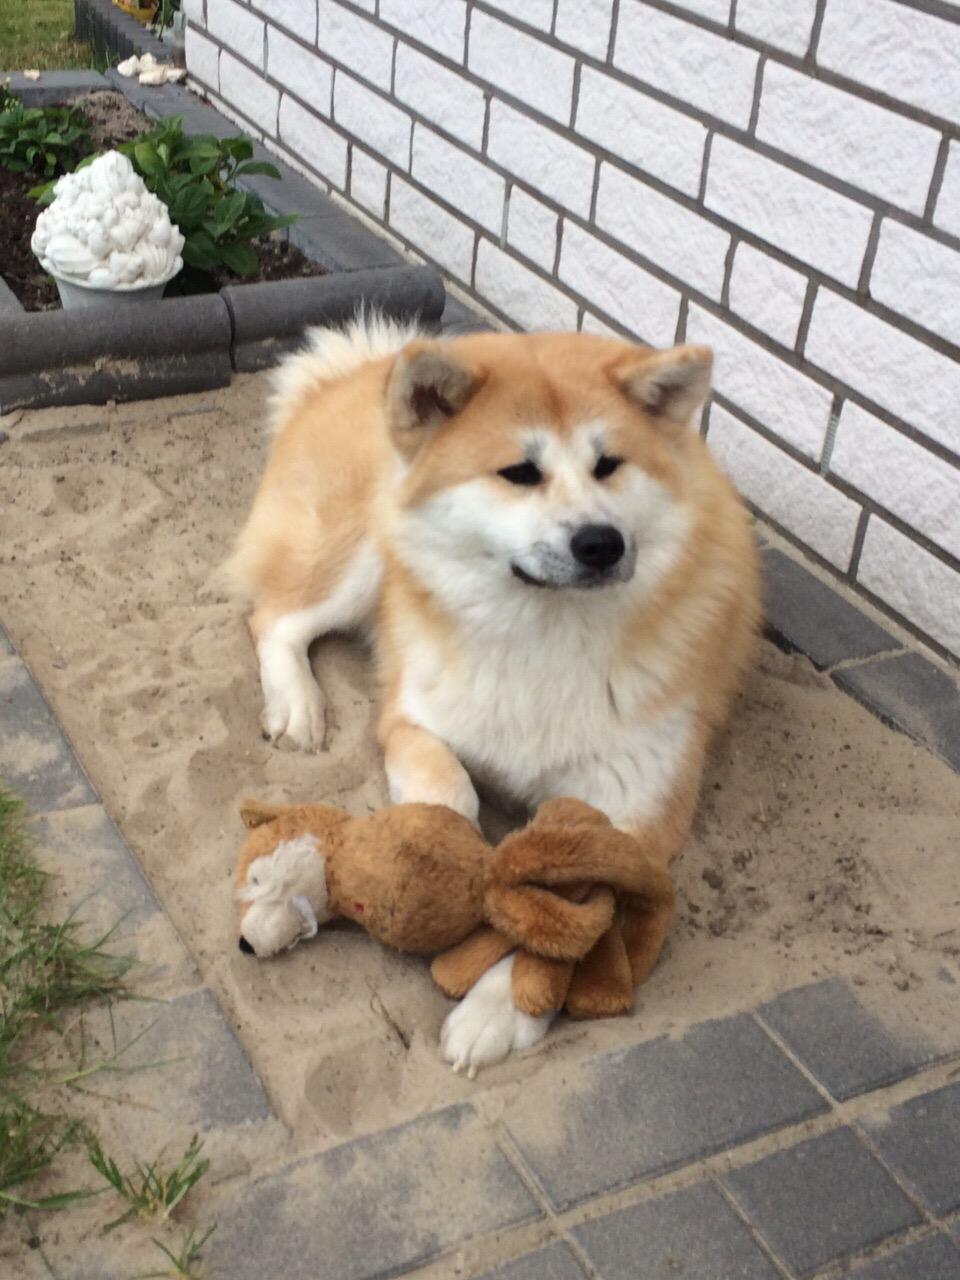 Me and my fox cuddling